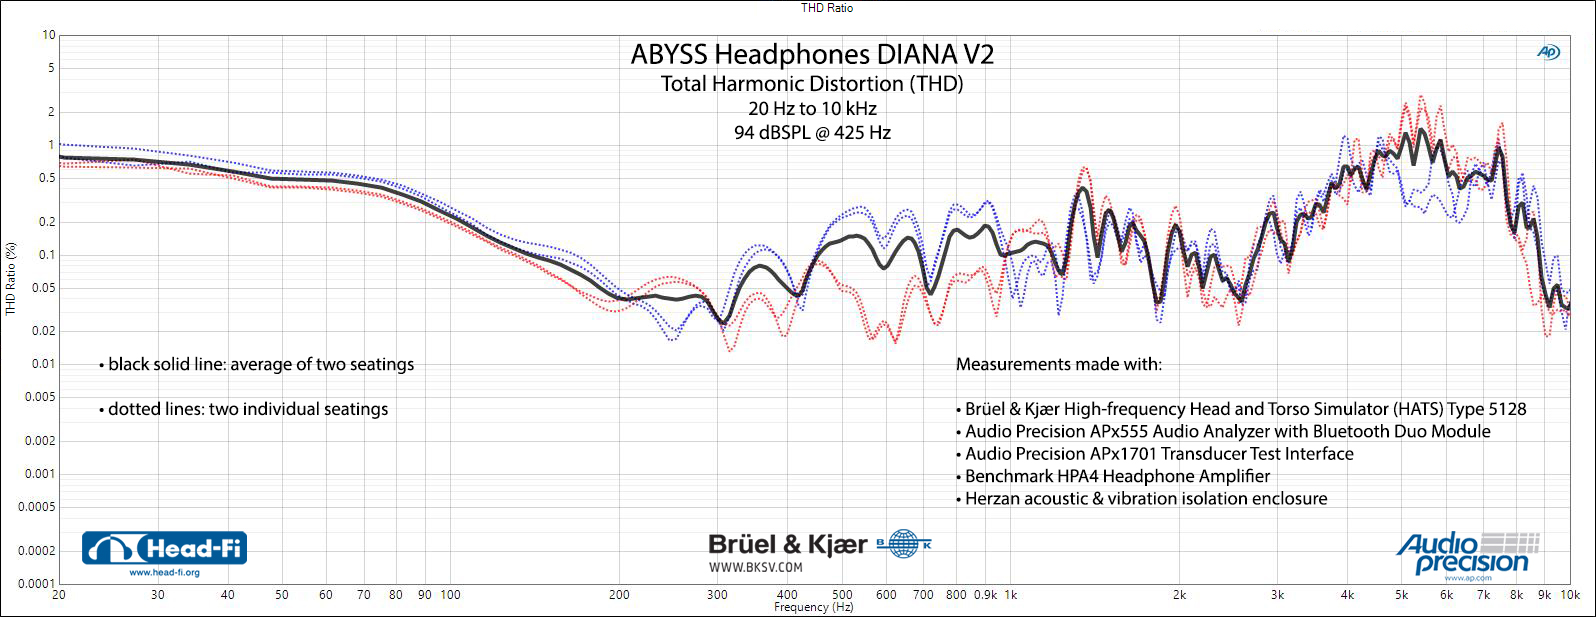 Abyss-Headphones-Diana-V2---SEAT-01-02---THD---94-dBSPL-425-Hz.jpg